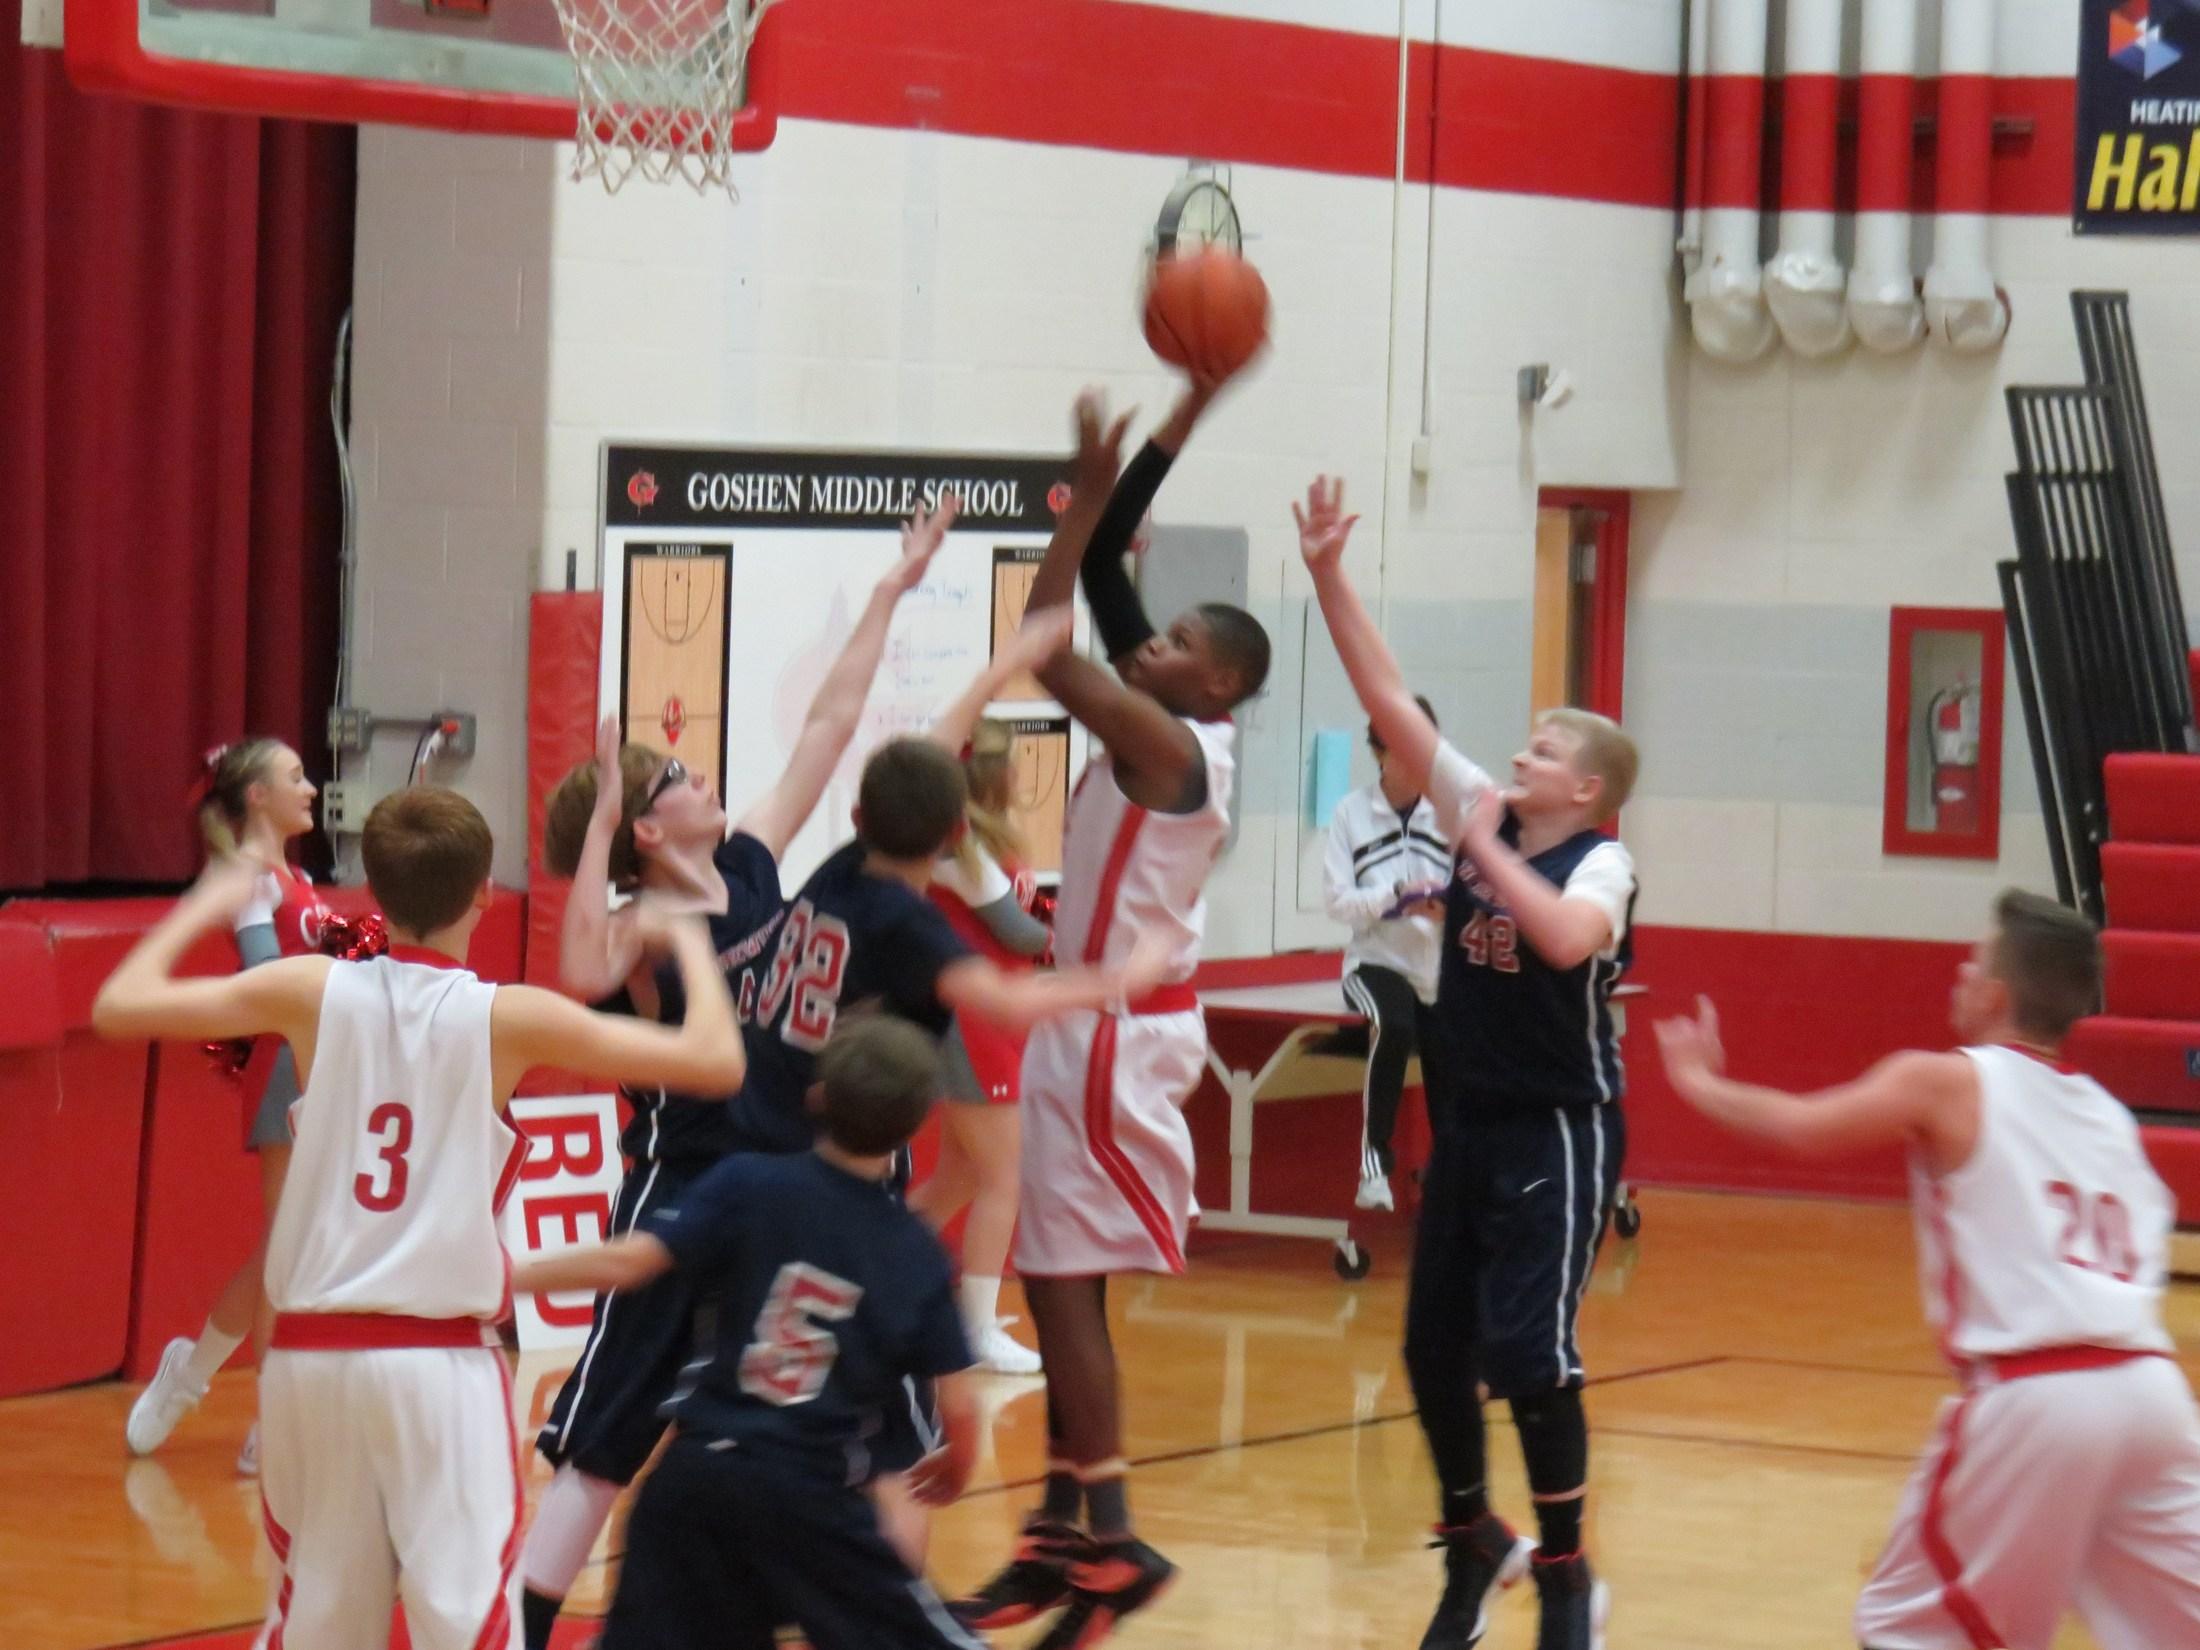 7th grade boys basketball player Jason Jackson